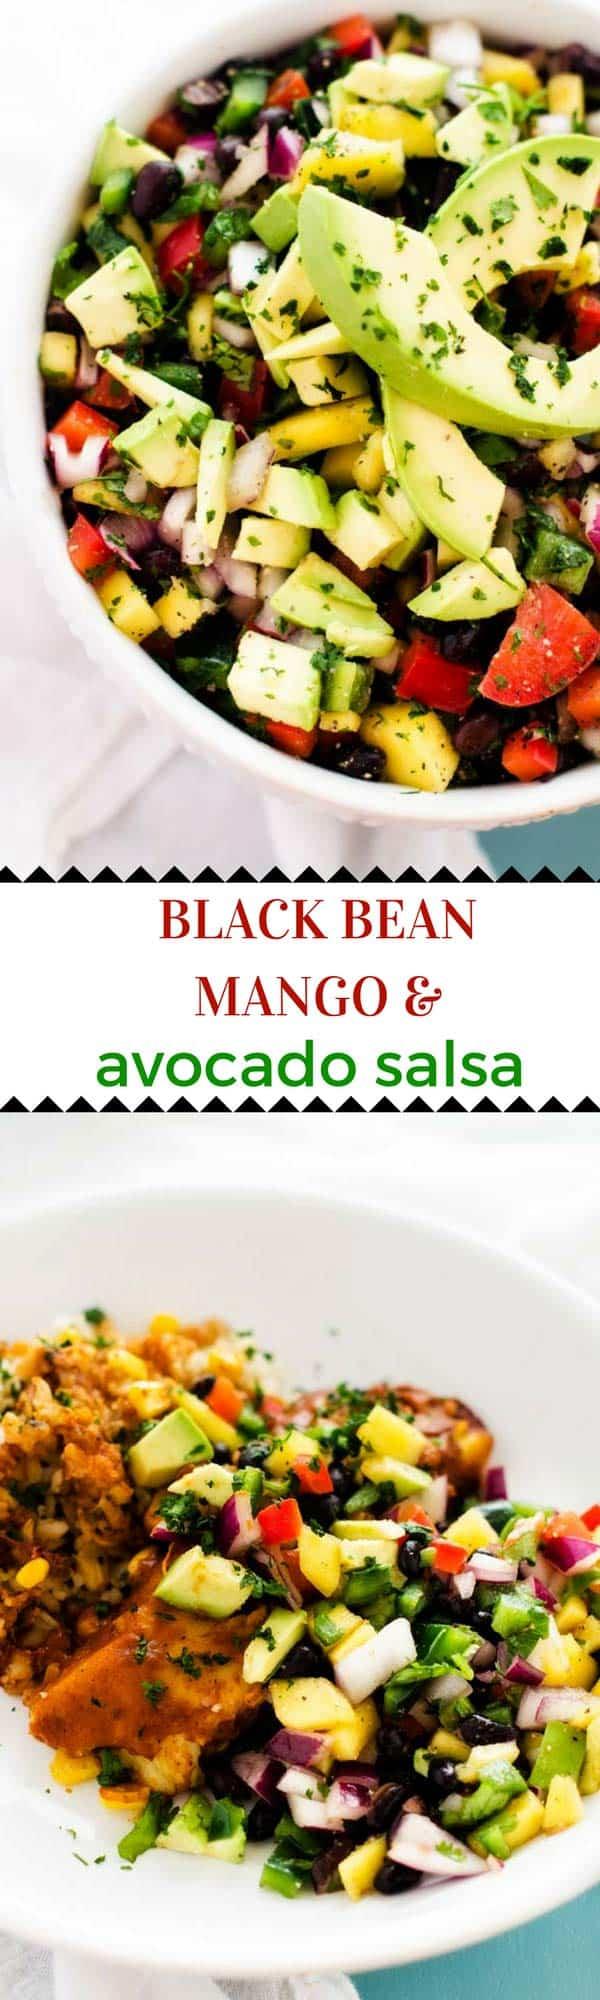 How To Make Black Bean Cakes